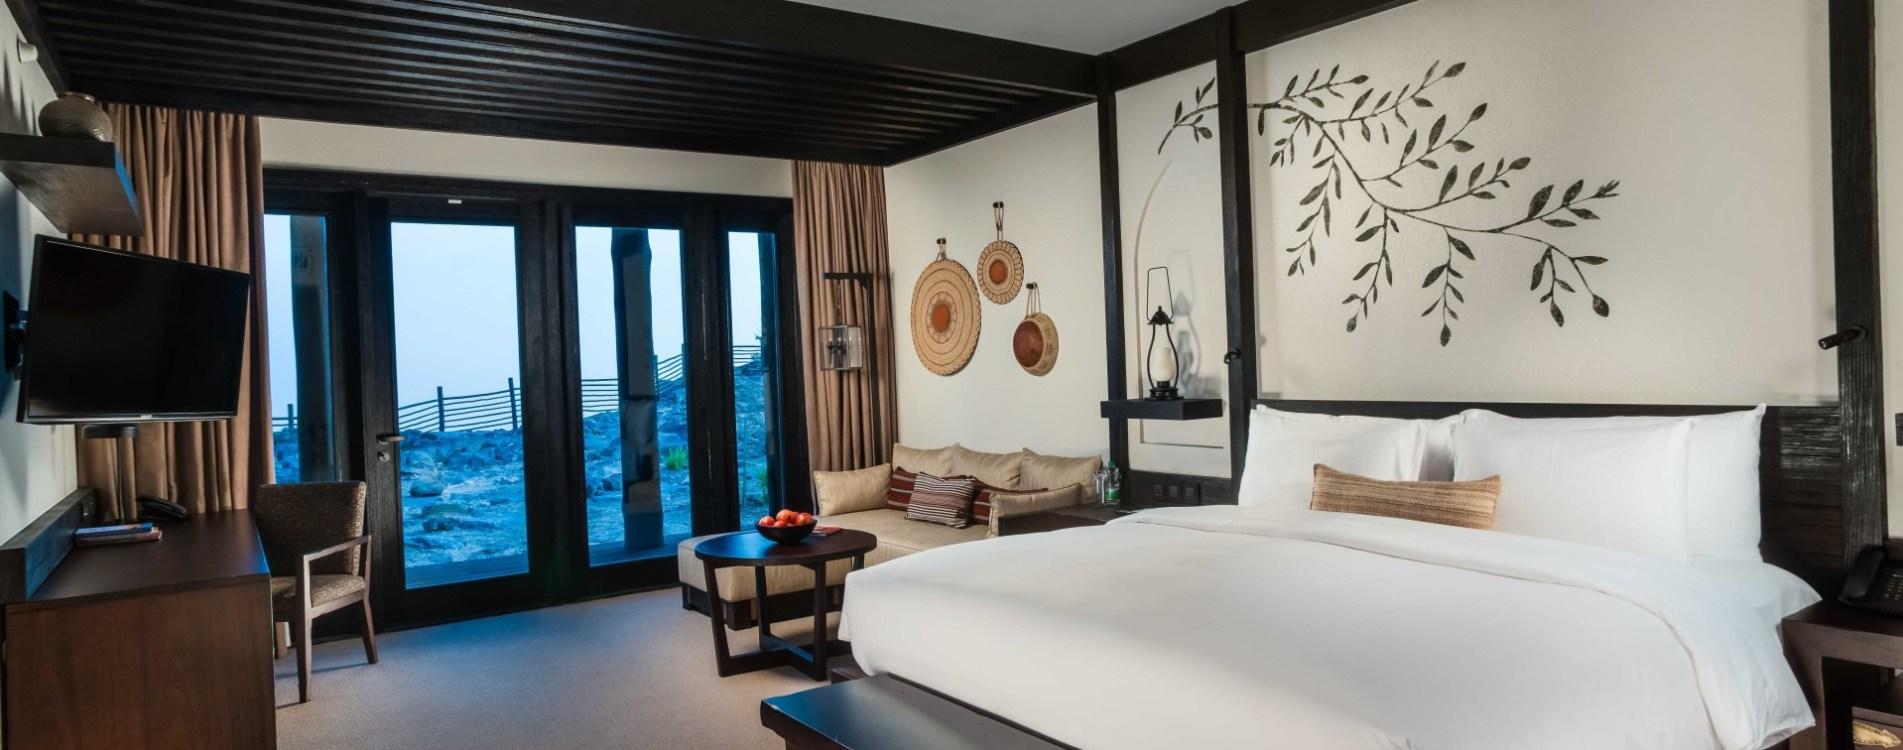 Alila-Jabal-Akhdar-Horizon-View-Suite-Schlafzimmer-Oman.jpg